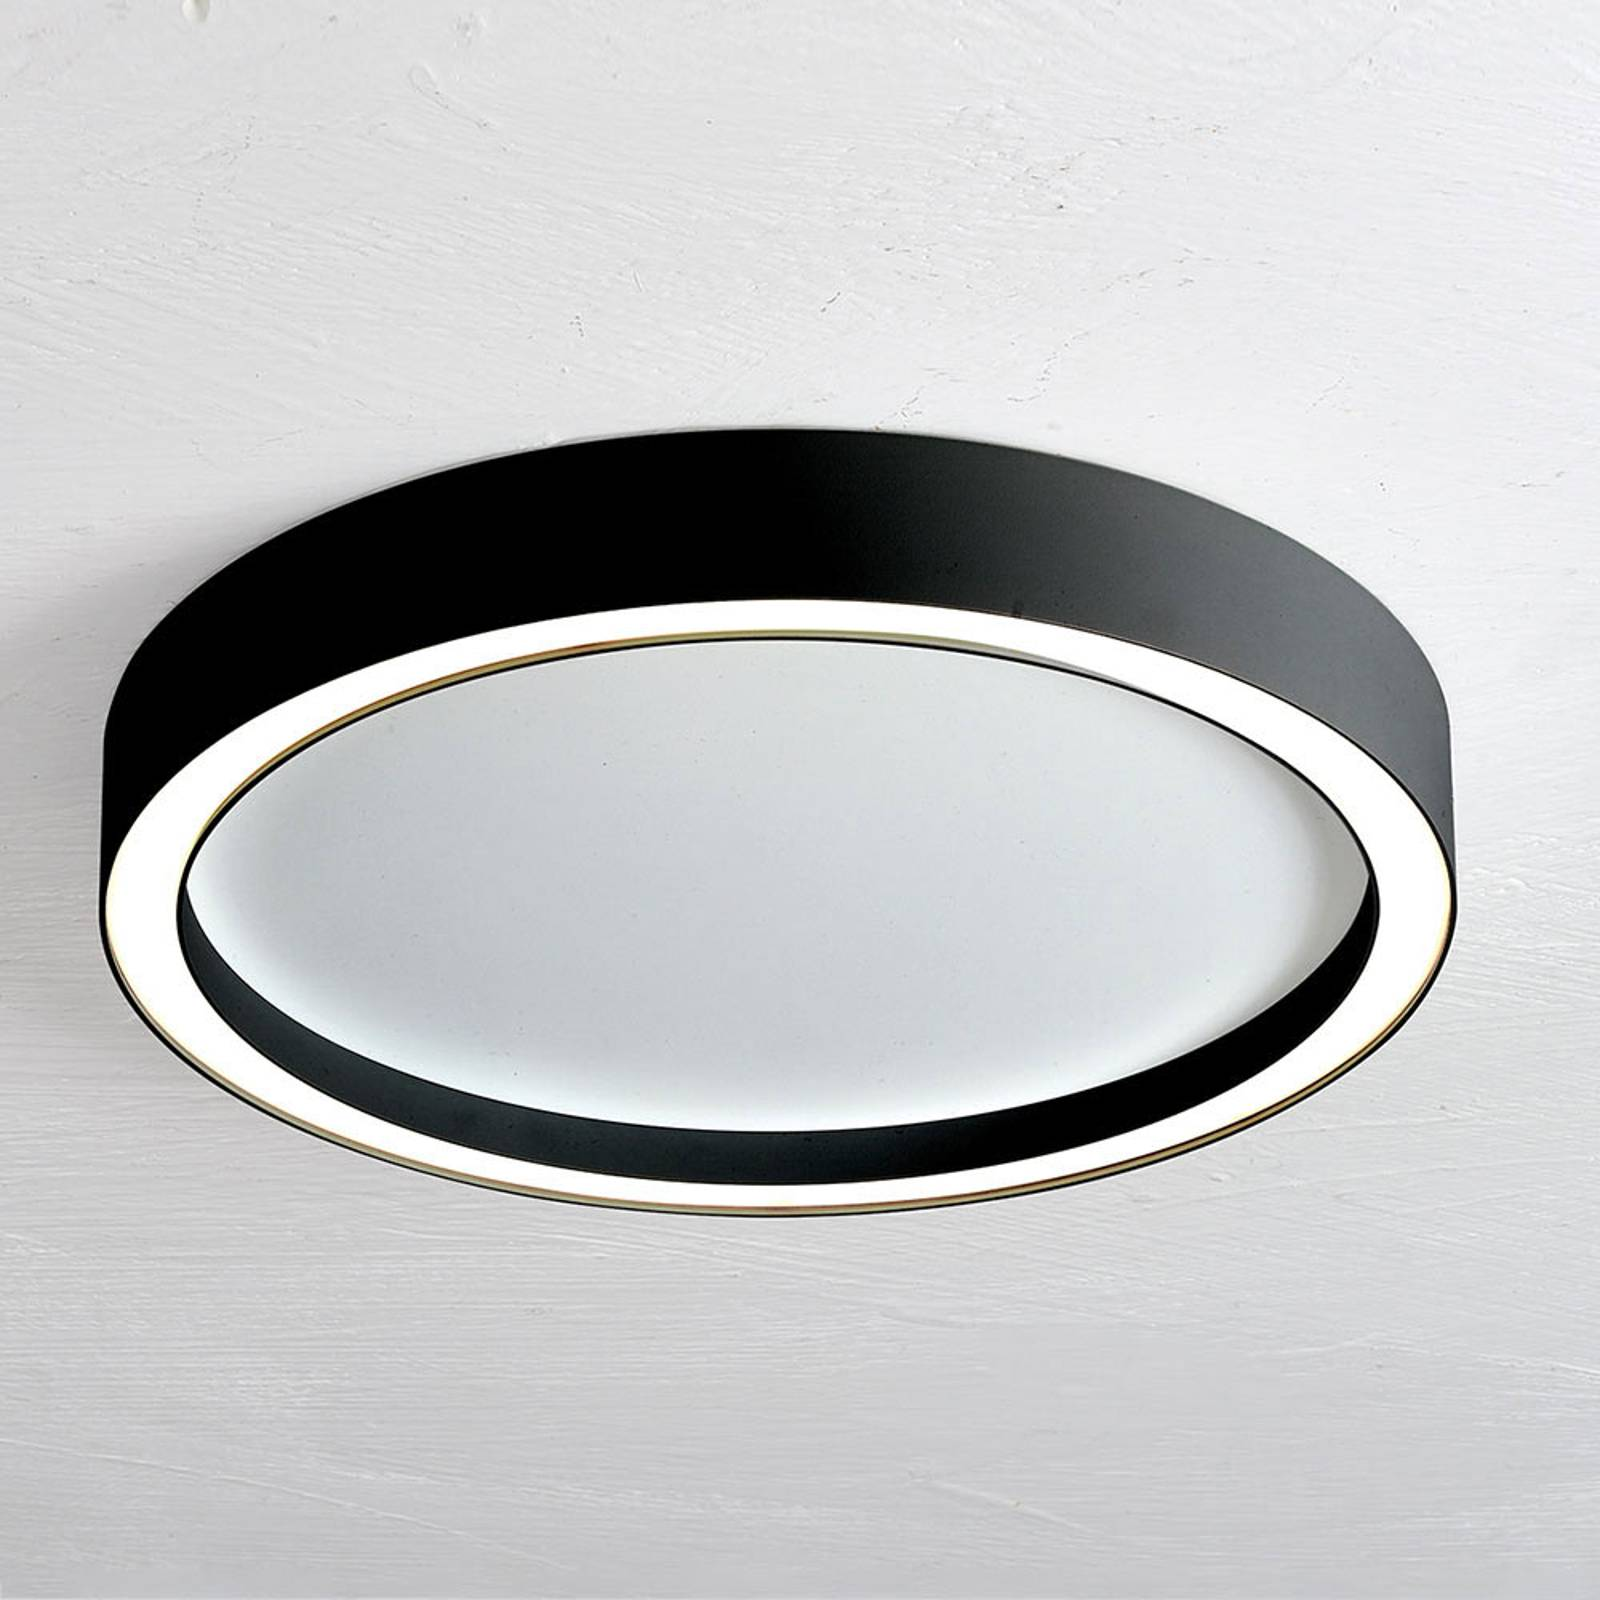 Bopp Aura LED-kattolamppu Ø 40 cm musta